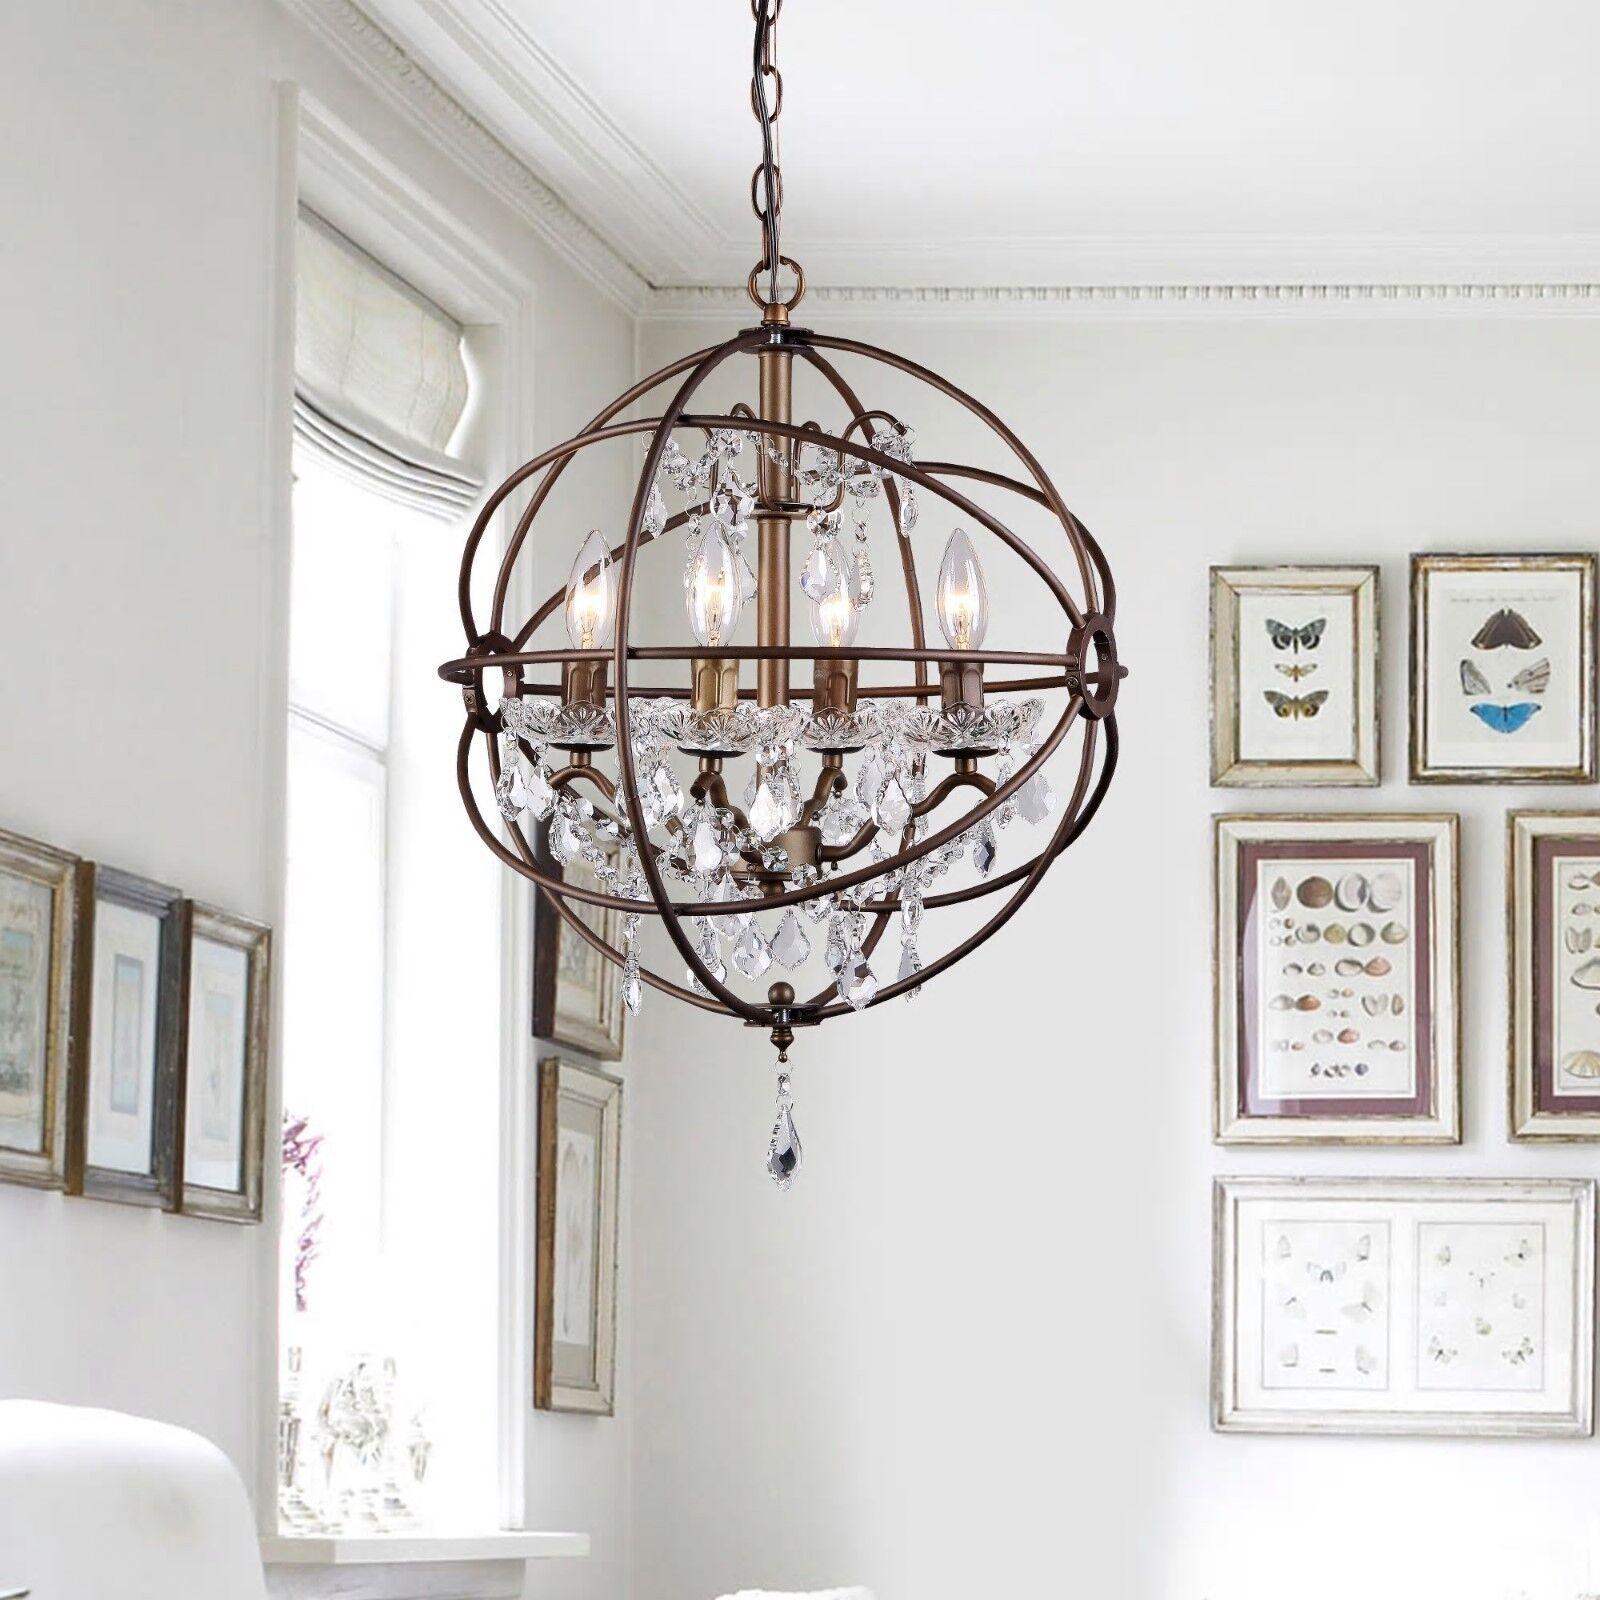 Modern Chandelier Lighting Globe 4 Lights Wood Ceiling: Modern Chandelier Globe 4 Light Metal Ceiling Fixture